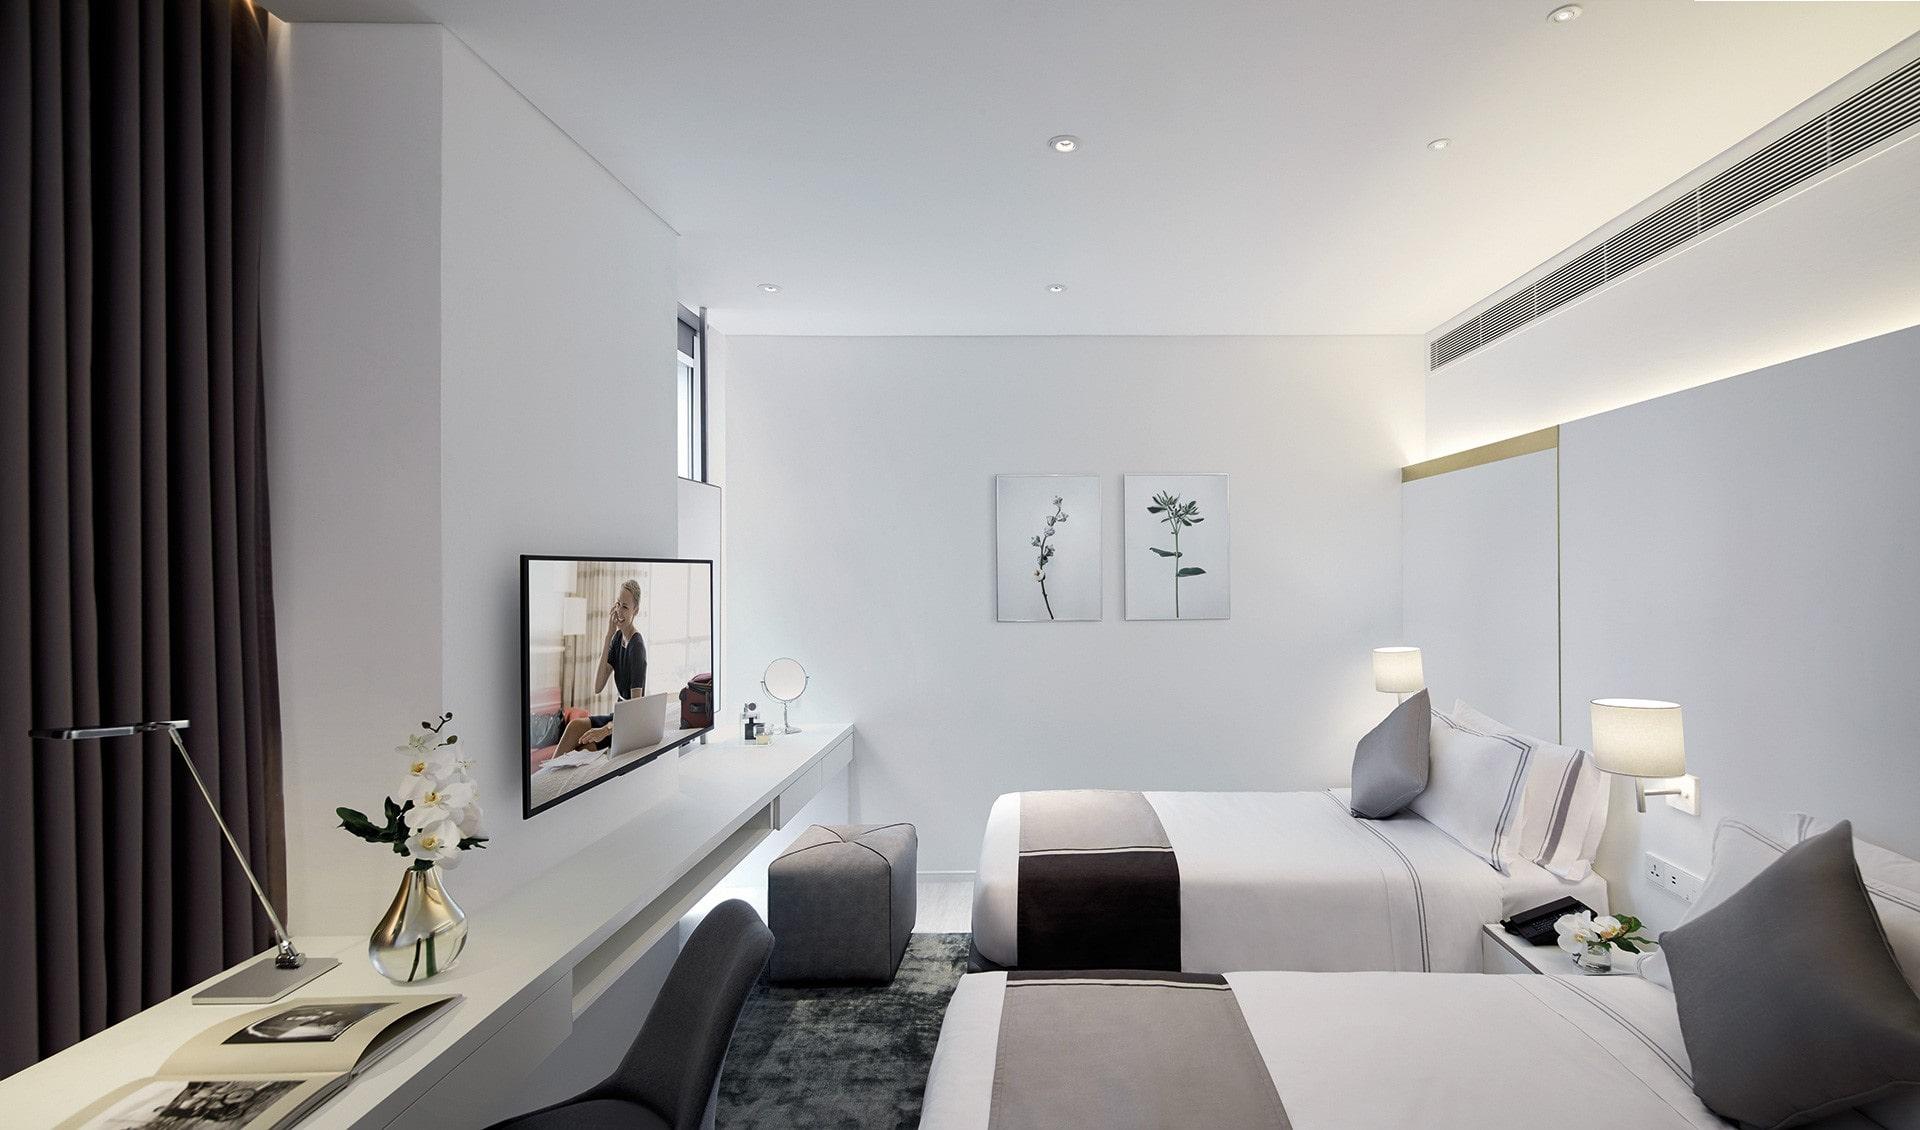 Somerset Maison Asoke Bangkok | Studio Deluxe リビングルーム